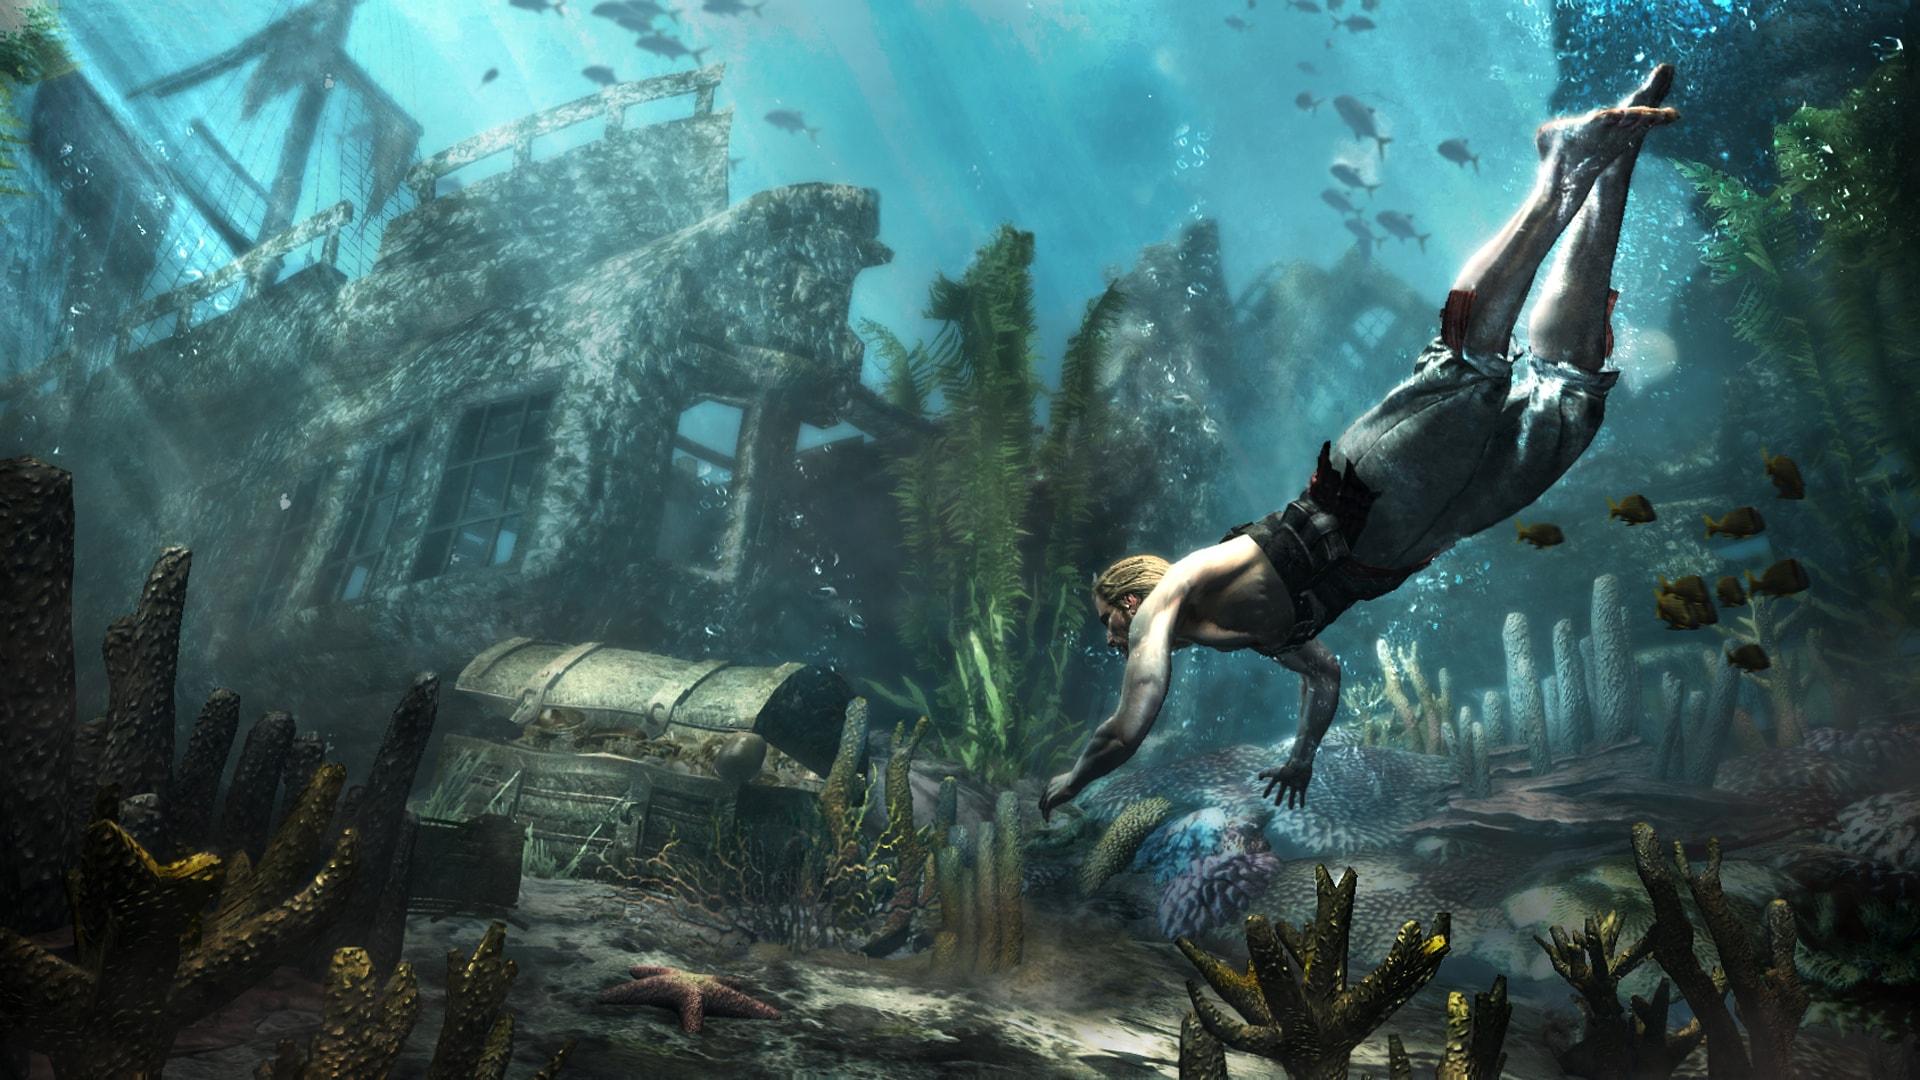 Assassin's Creed IV: Black Flag (PC) - Ubisoft Connect Key - GLOBAL - 3